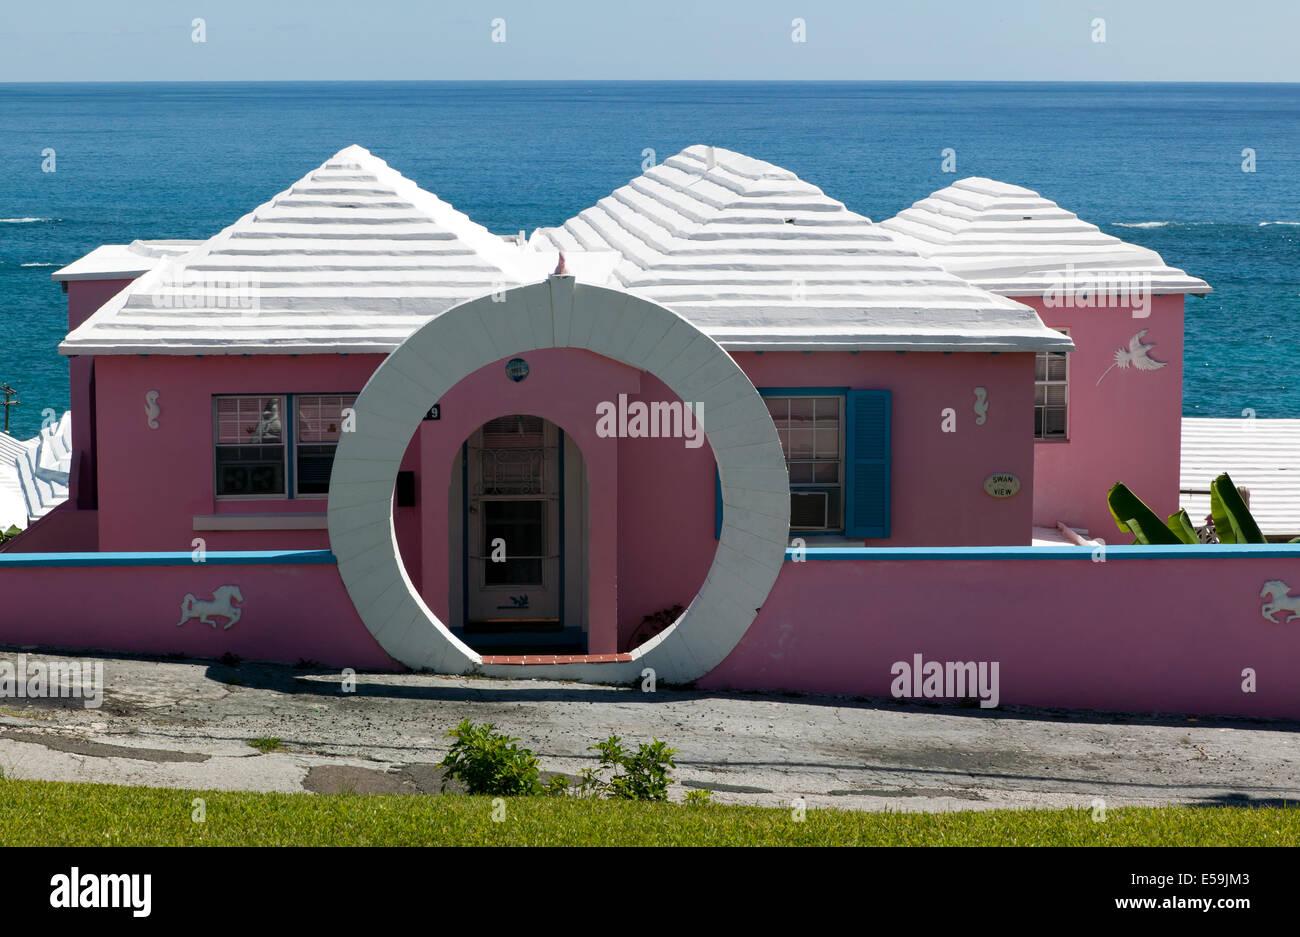 Close-up shot of a Bermudan house near St David's Lighthouse, St Davids Island, St George's Parish, Bermuda - Stock Image